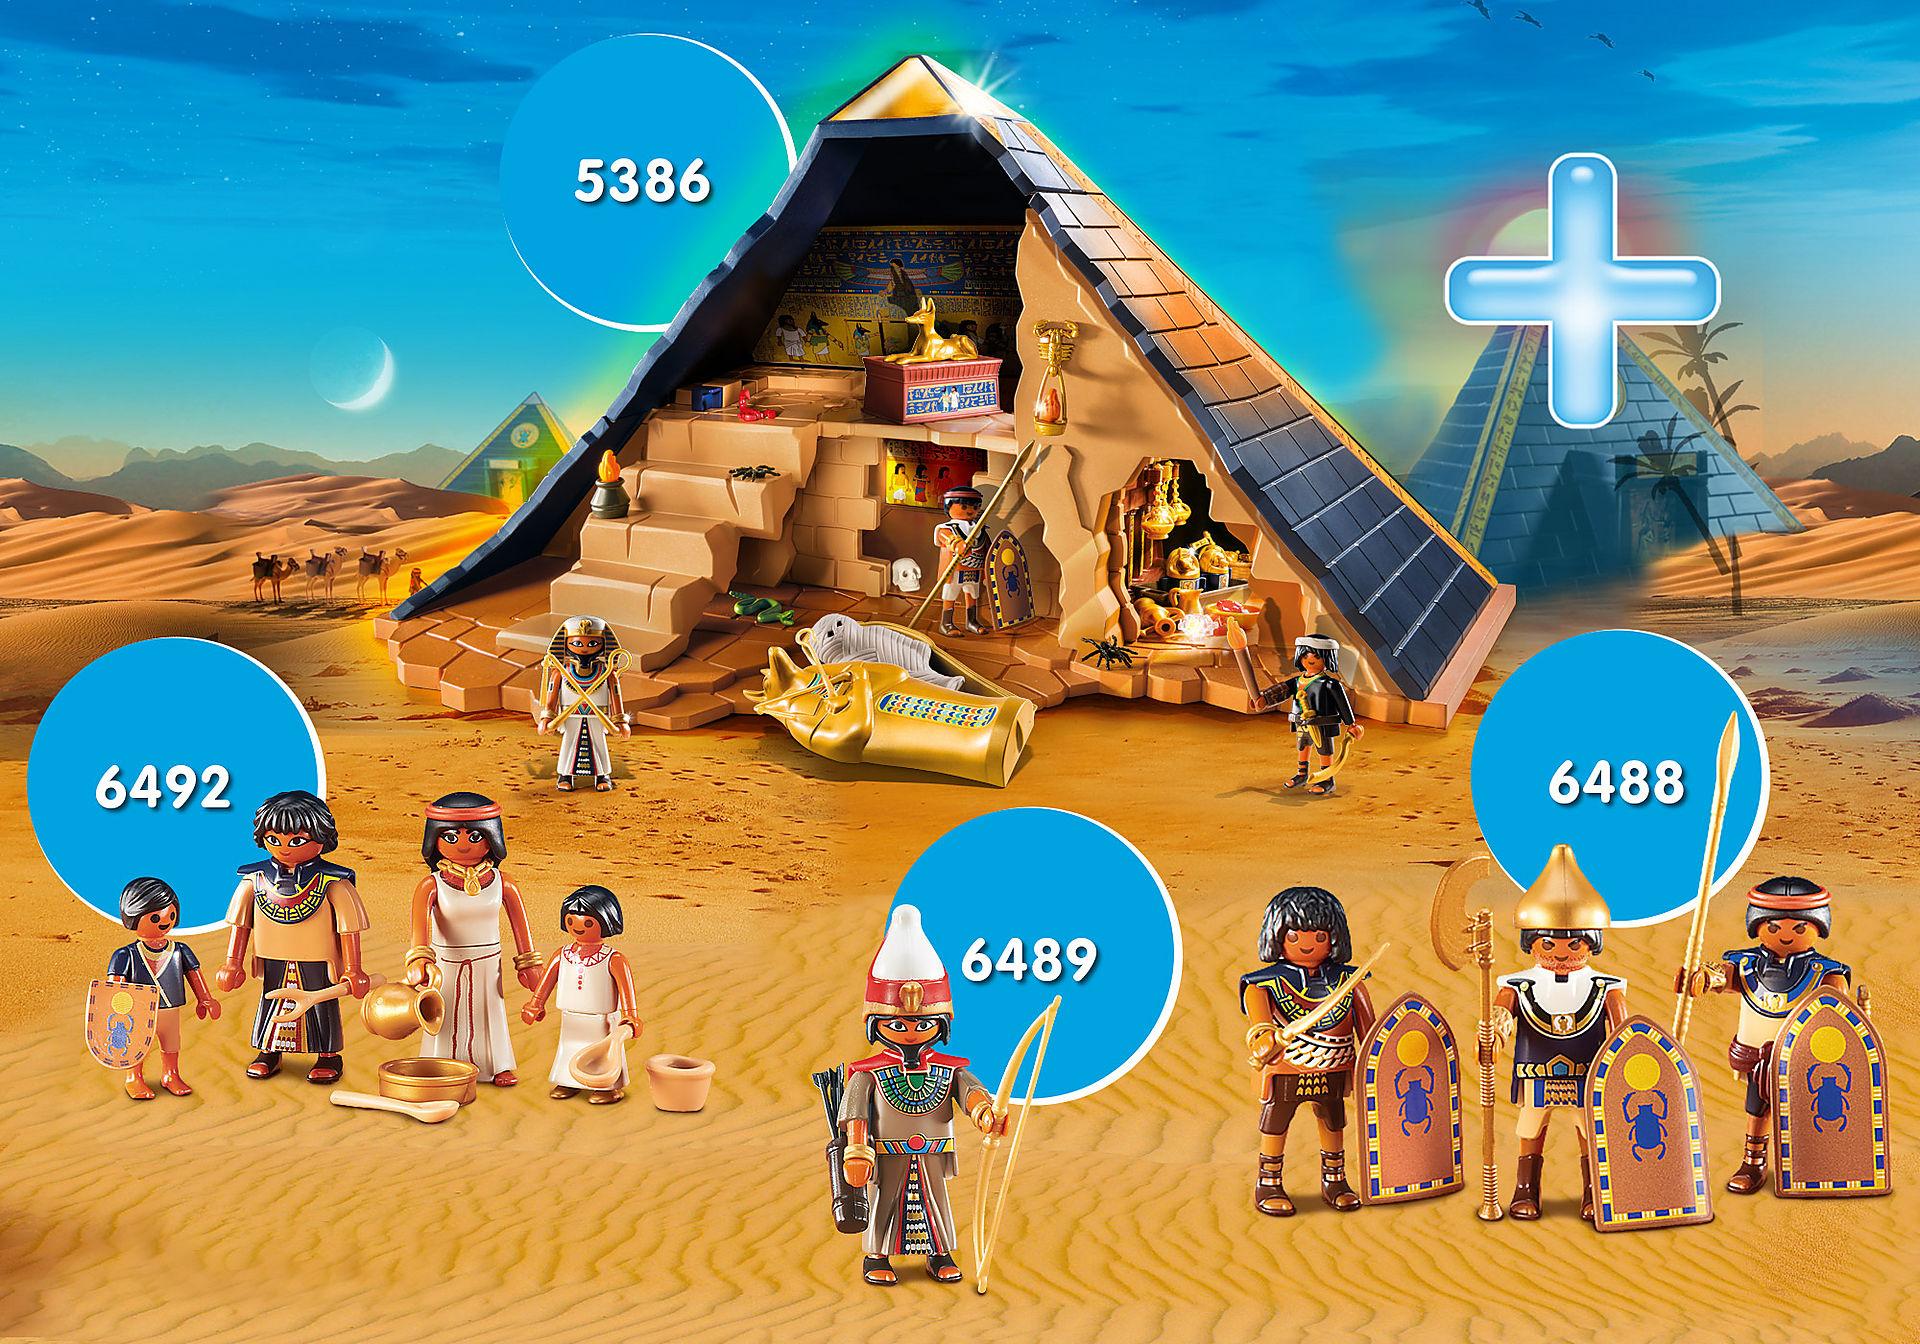 Playmobil Pyramid Bundle £32 (Using code) + Free delivery @ Playmobil